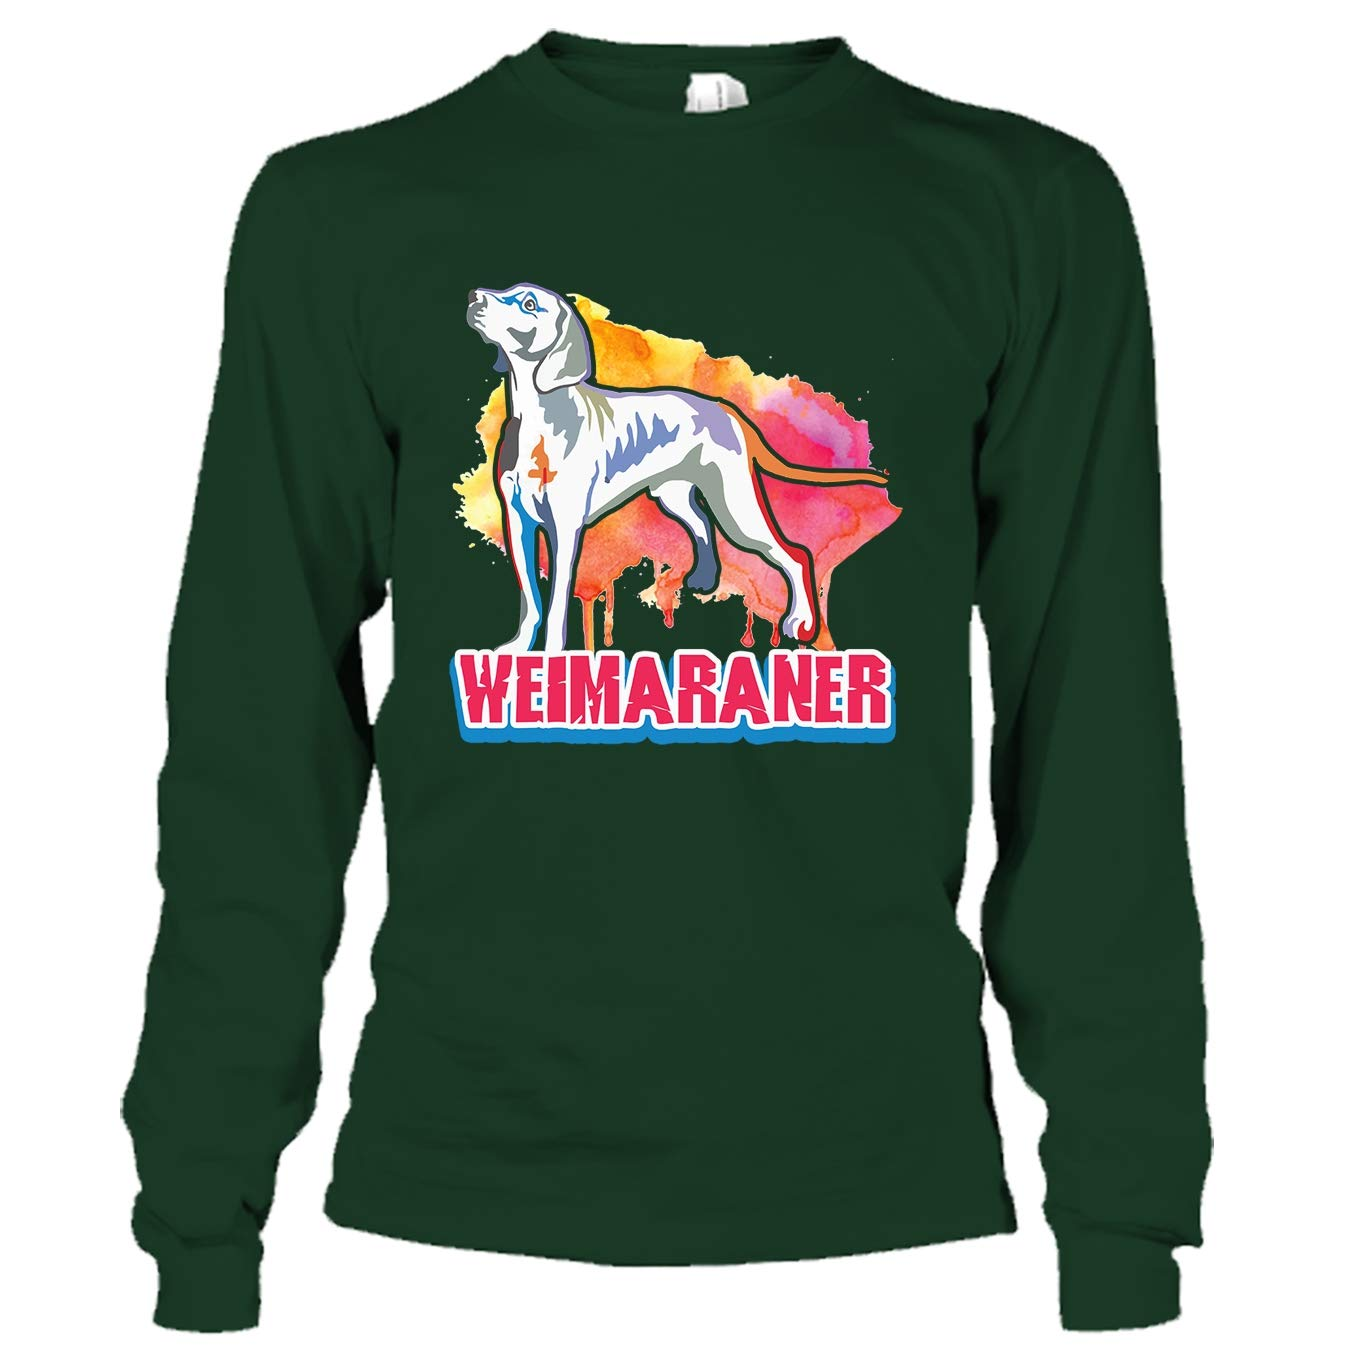 Weimaraner Coolest Dog Ever Tshirt Weimaraner Cool Tee Shirt